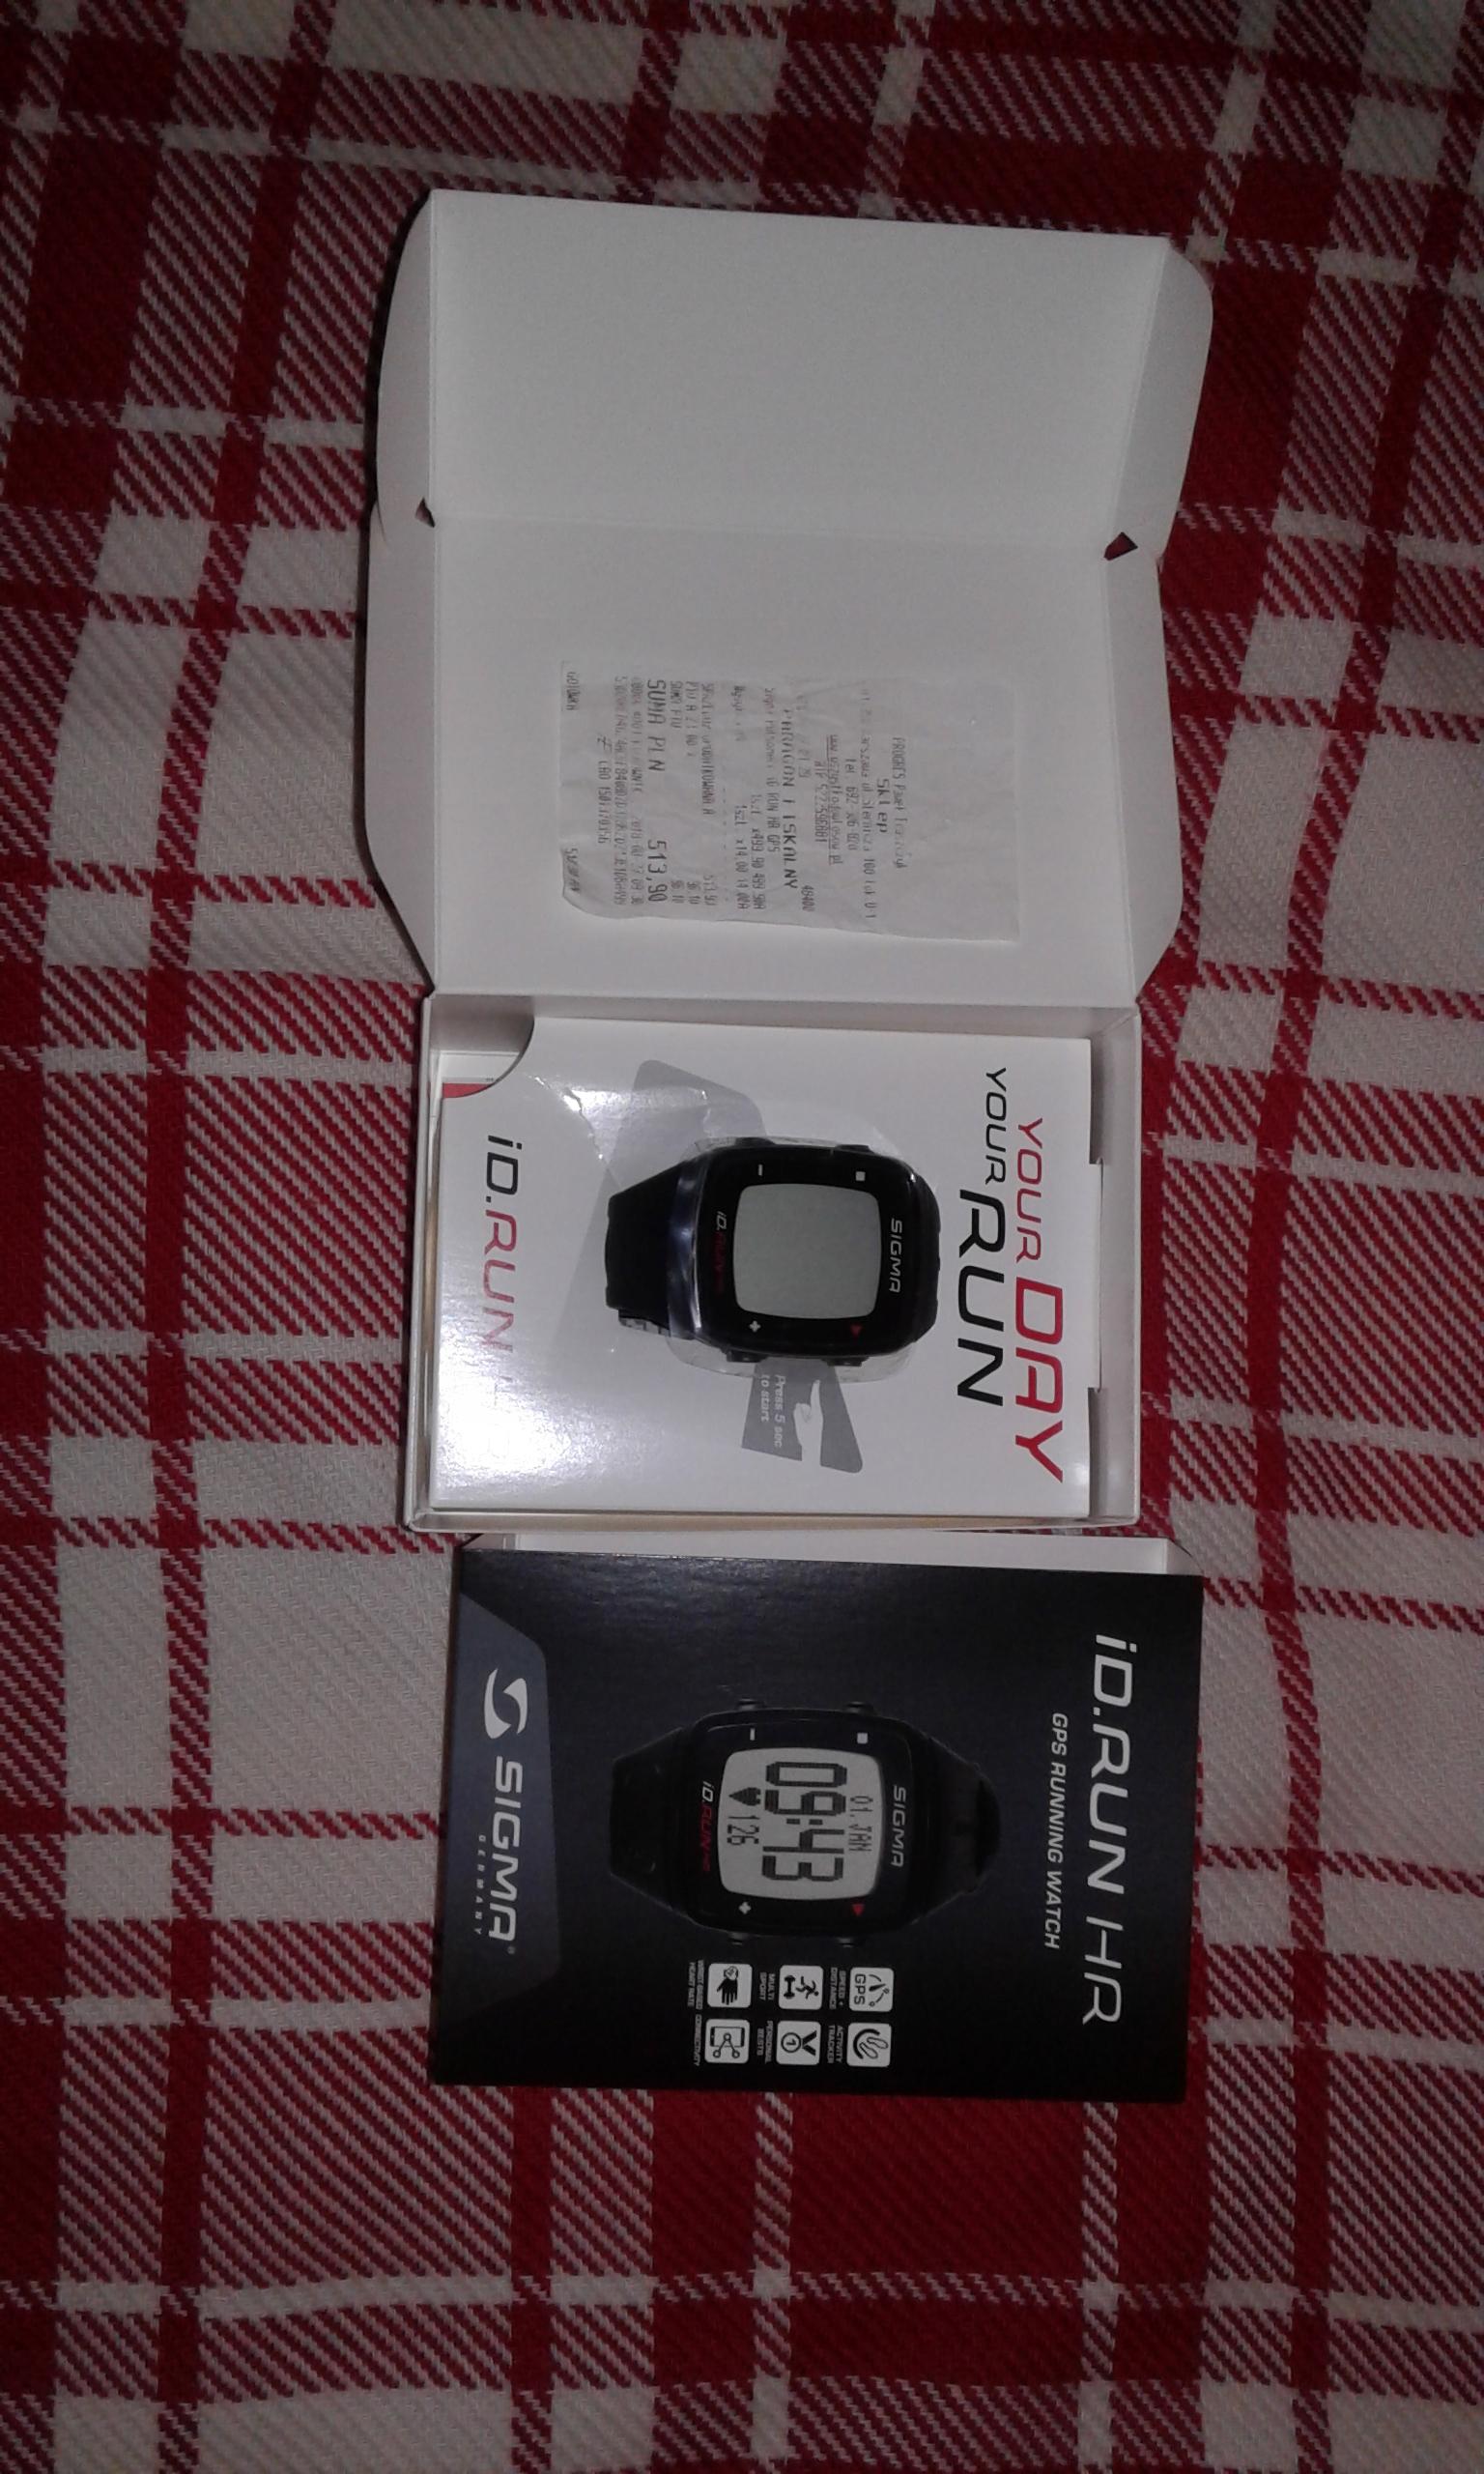 Zegarek sportowy Sigma ID Run HR - GPS, pulsometr